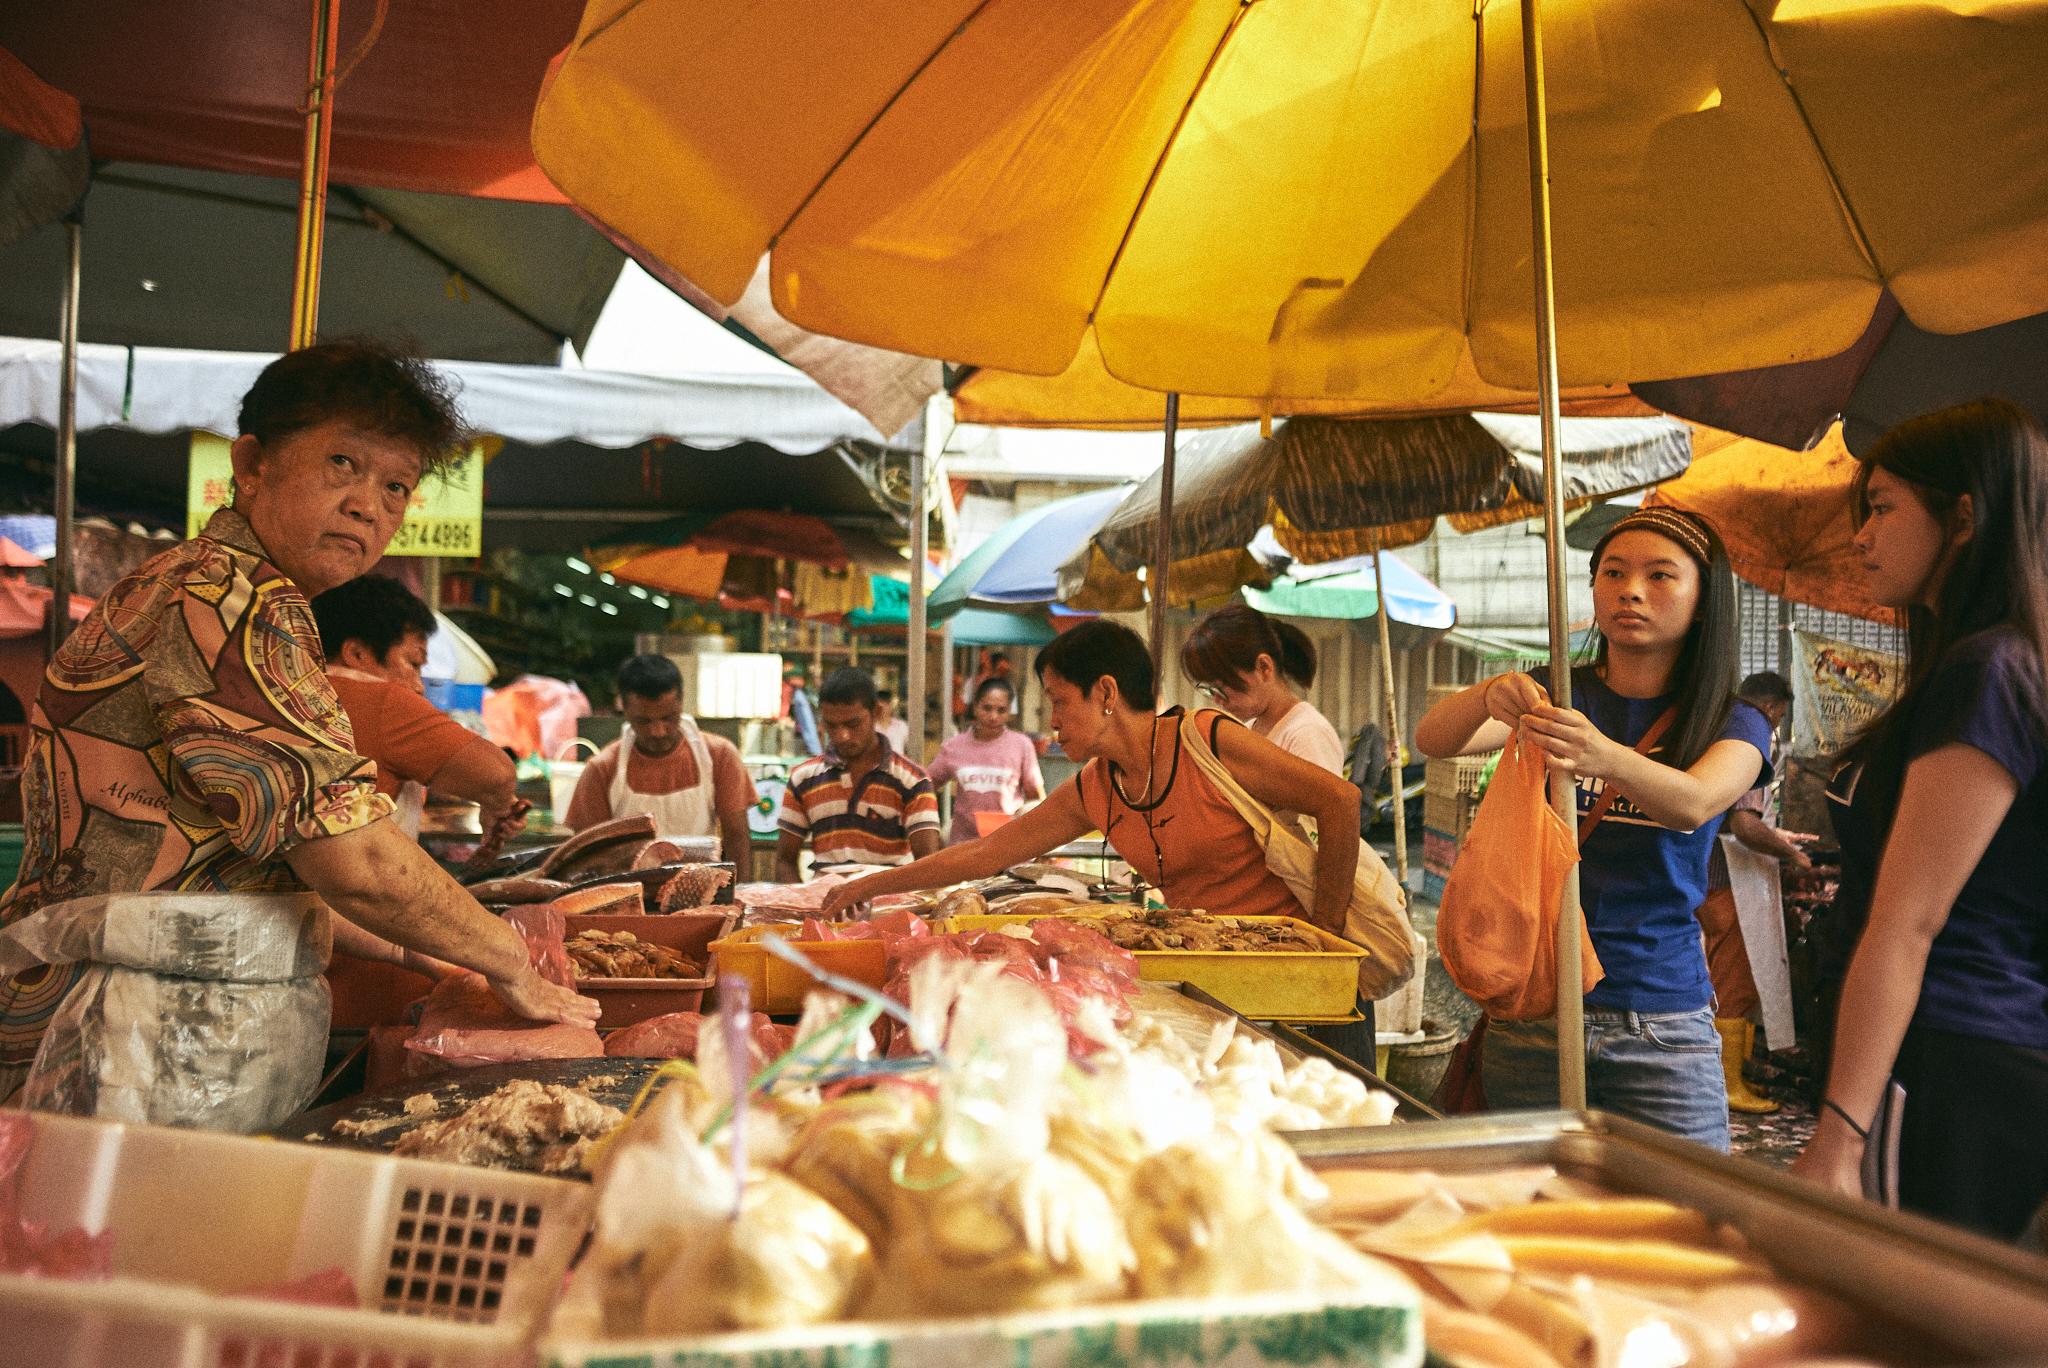 kuala lumpur street photography, seafood